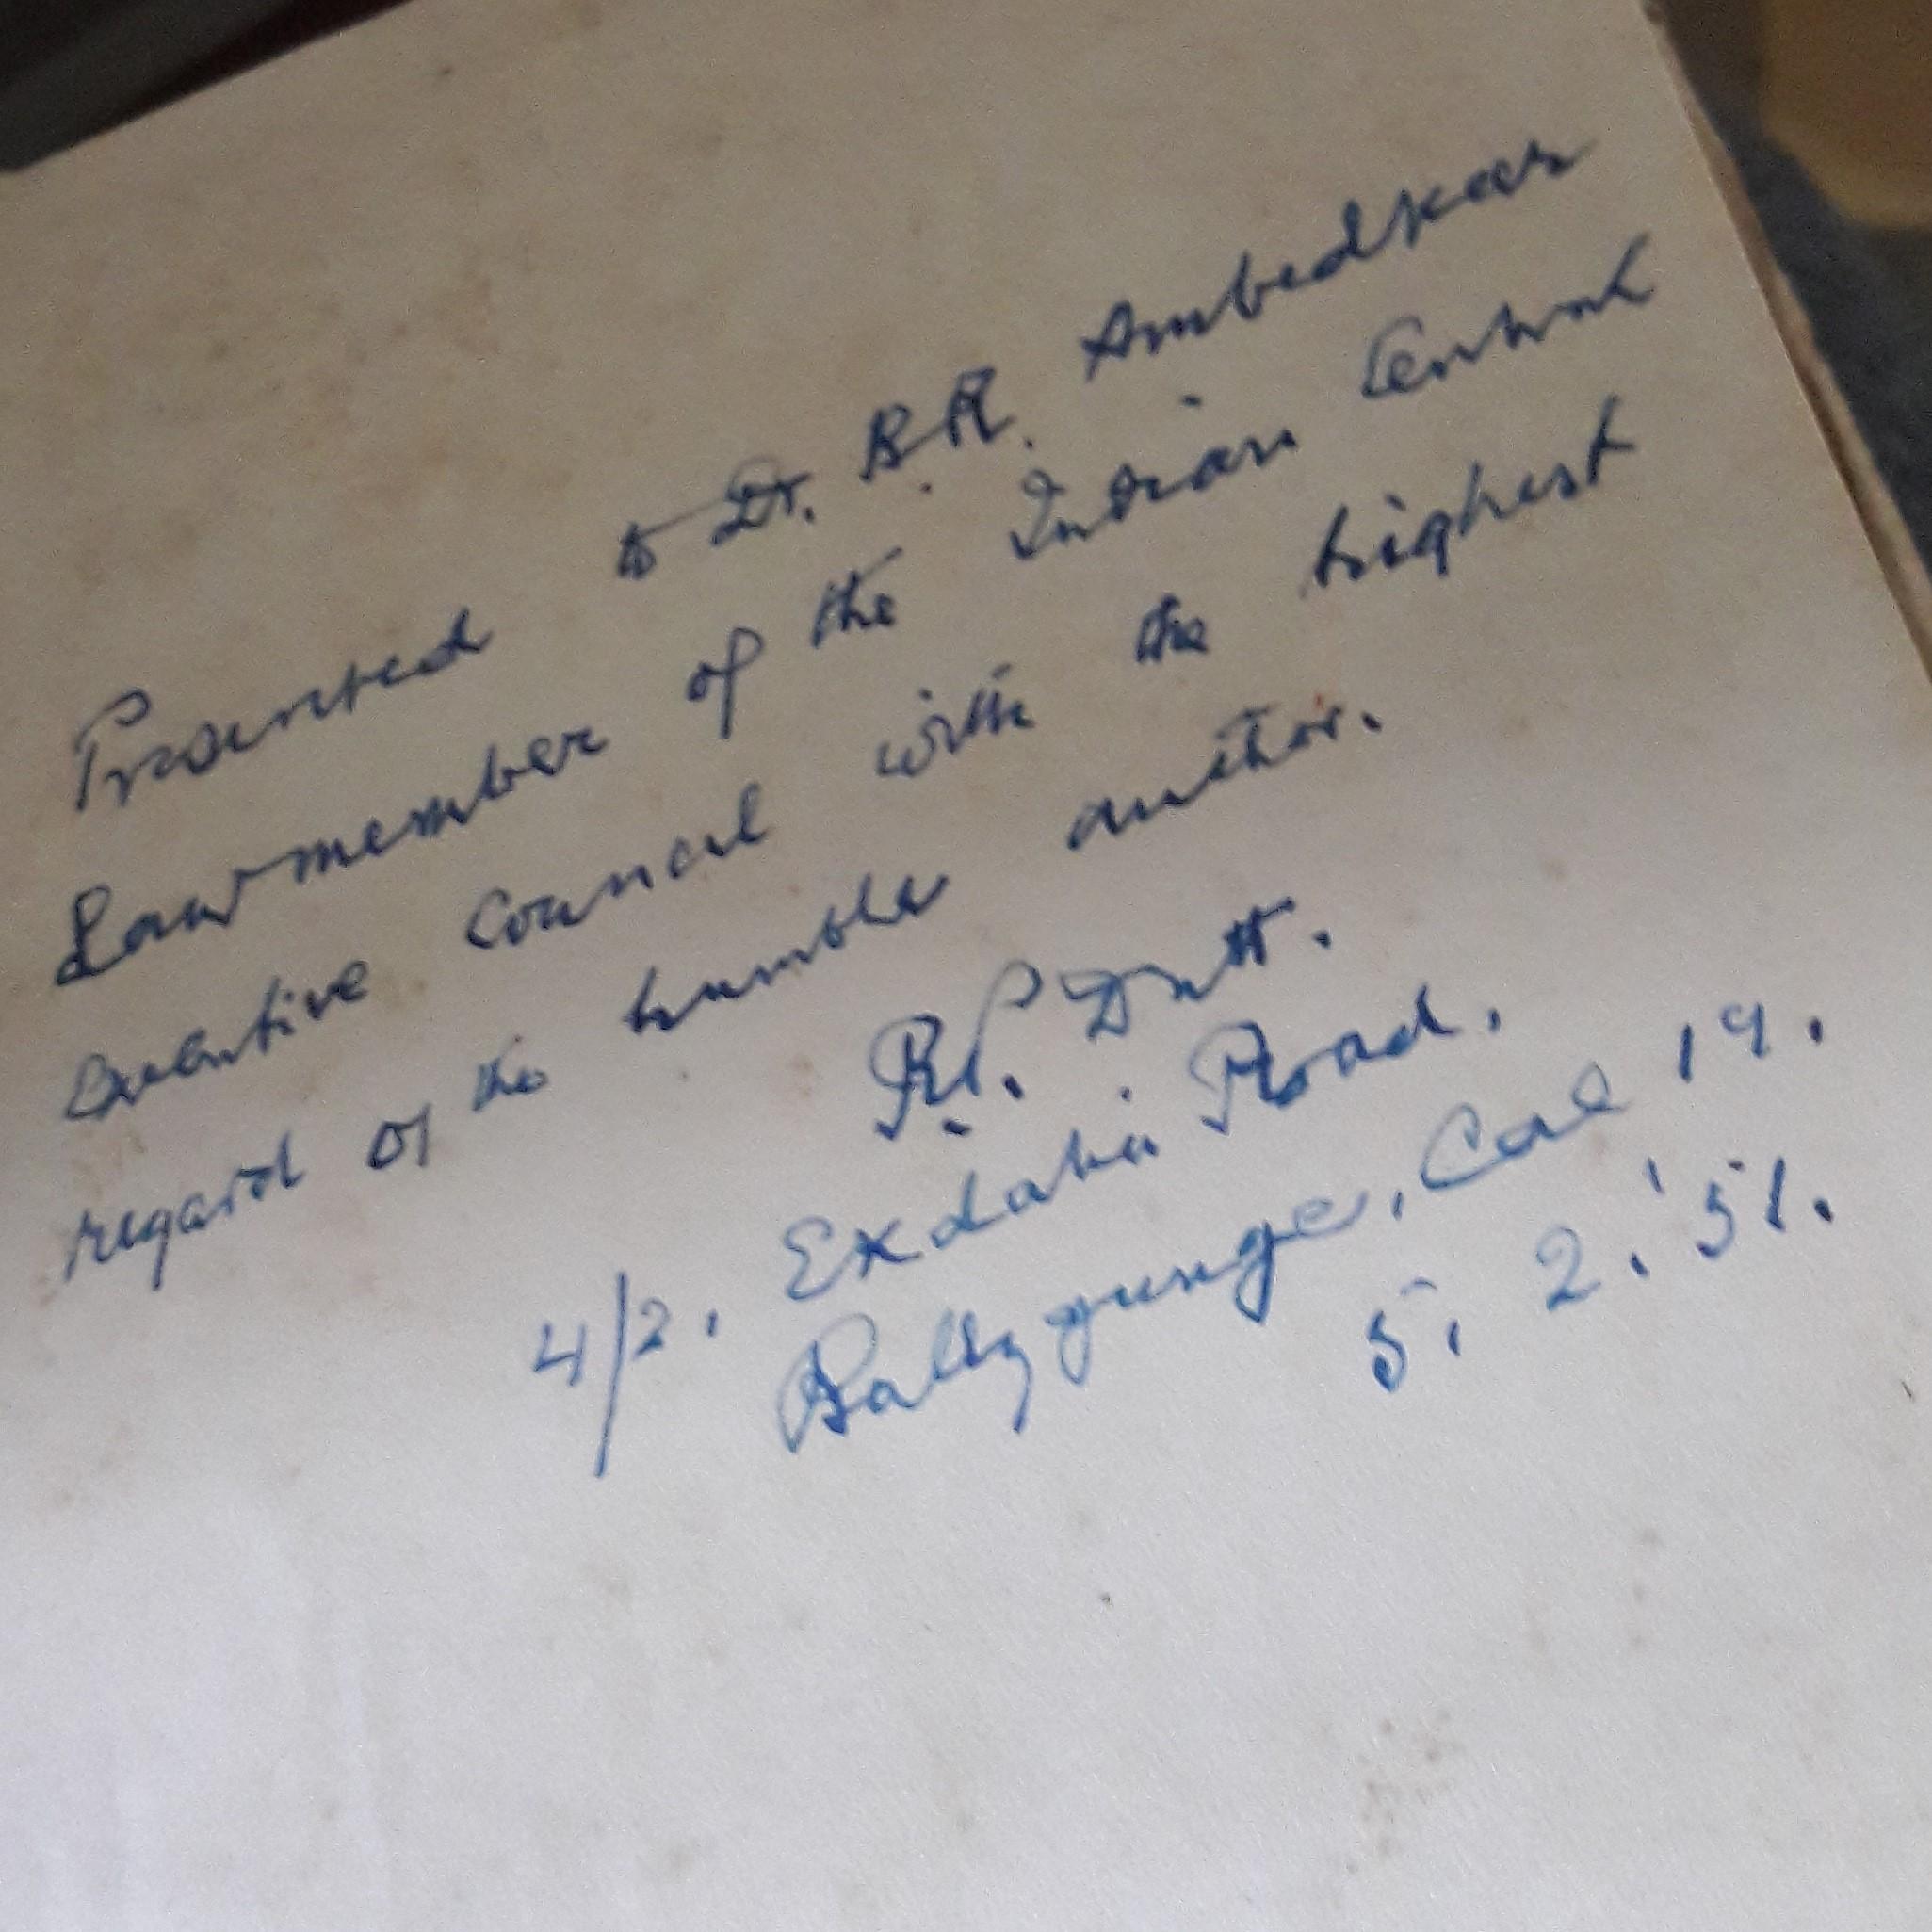 Palme Dutt's inscription. Credit: Siddhartha College Library, Mumbai